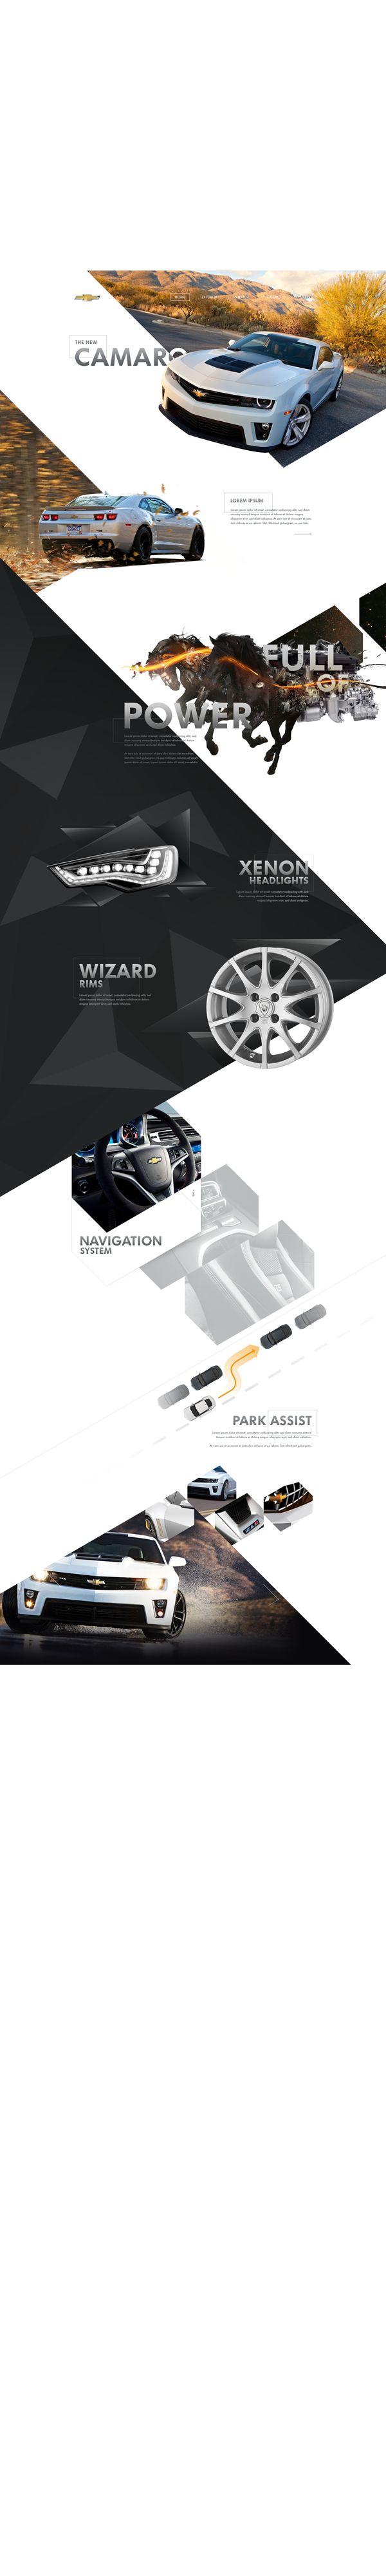 Webdesign Collection Vol.1 by Oliver Gareis, via Behance